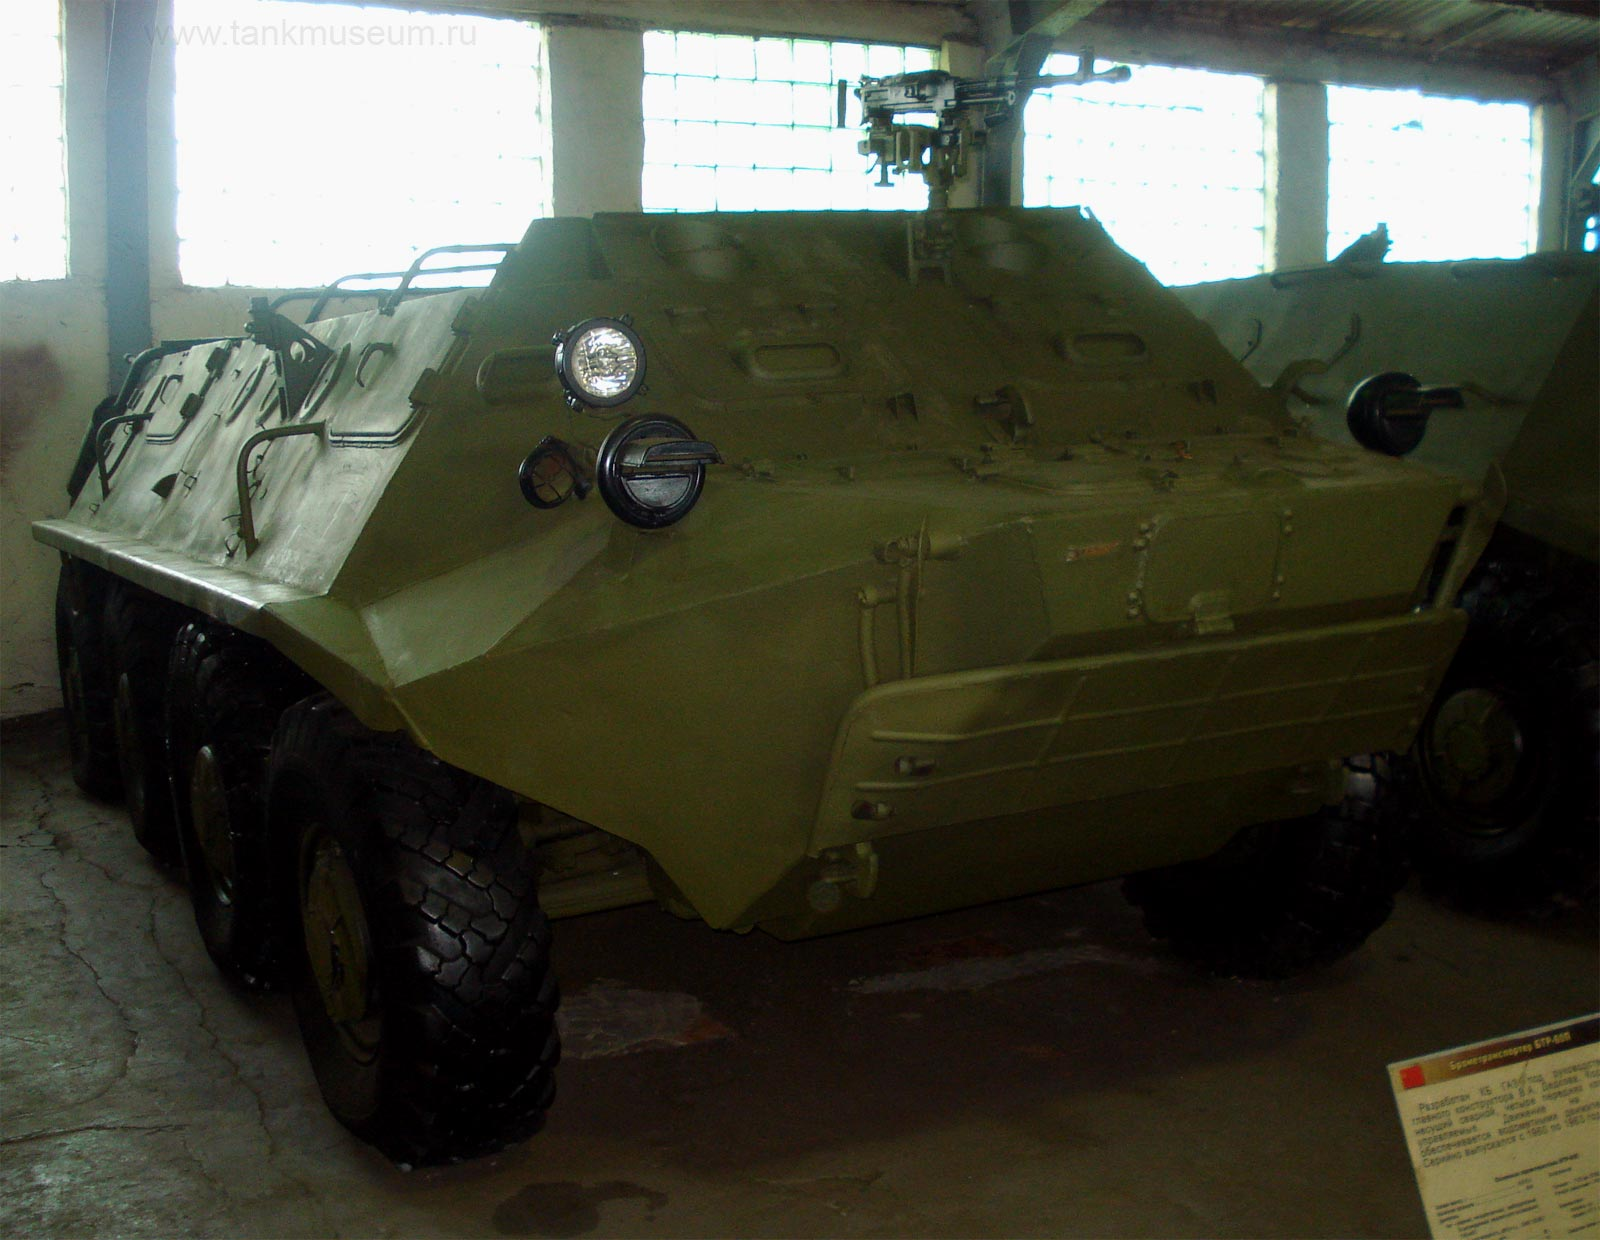 Бронетранспортер БТР-60П (СССР)